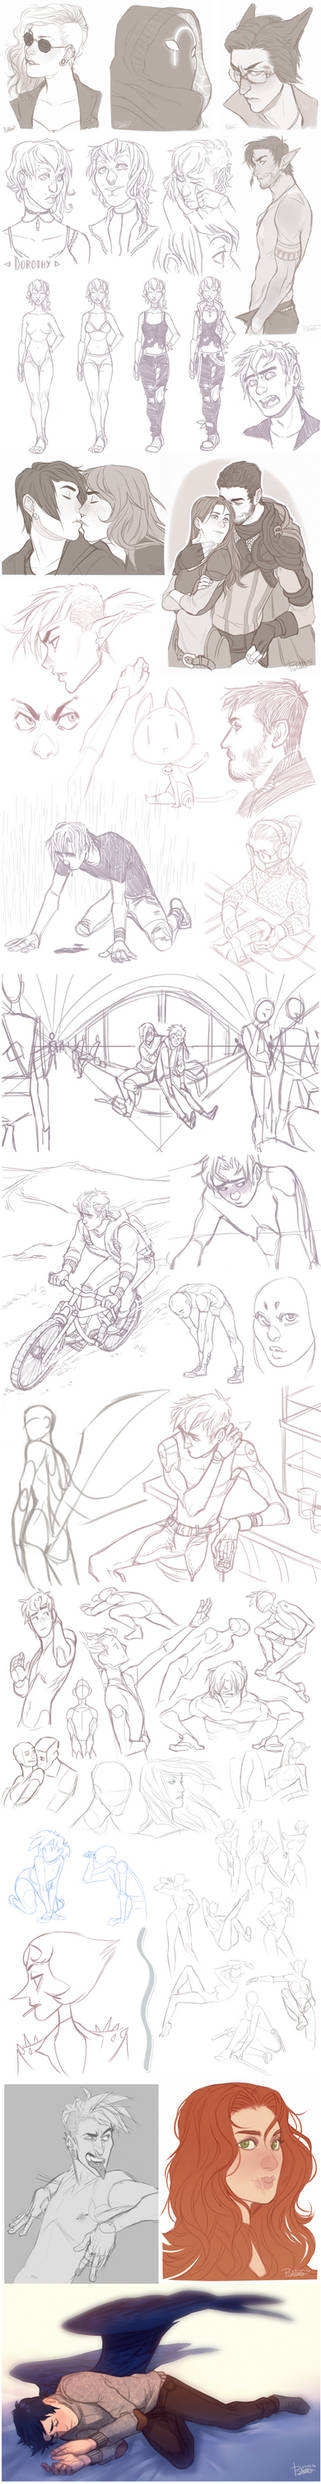 Sketch Dump 14